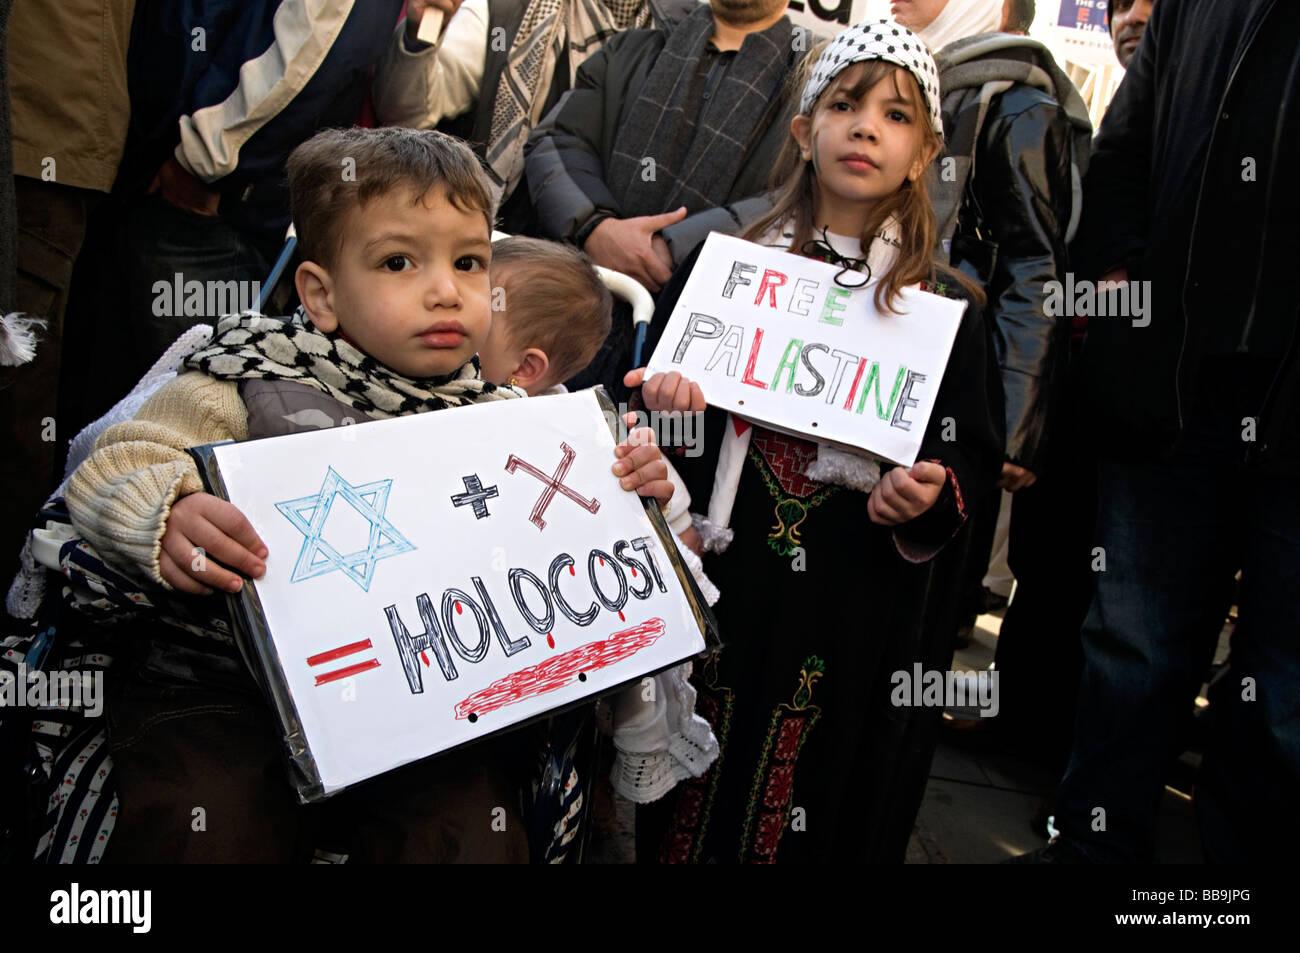 gaza protest birmingham in 2009 protest about israels invasion of gaza in november 2008 - Stock Image